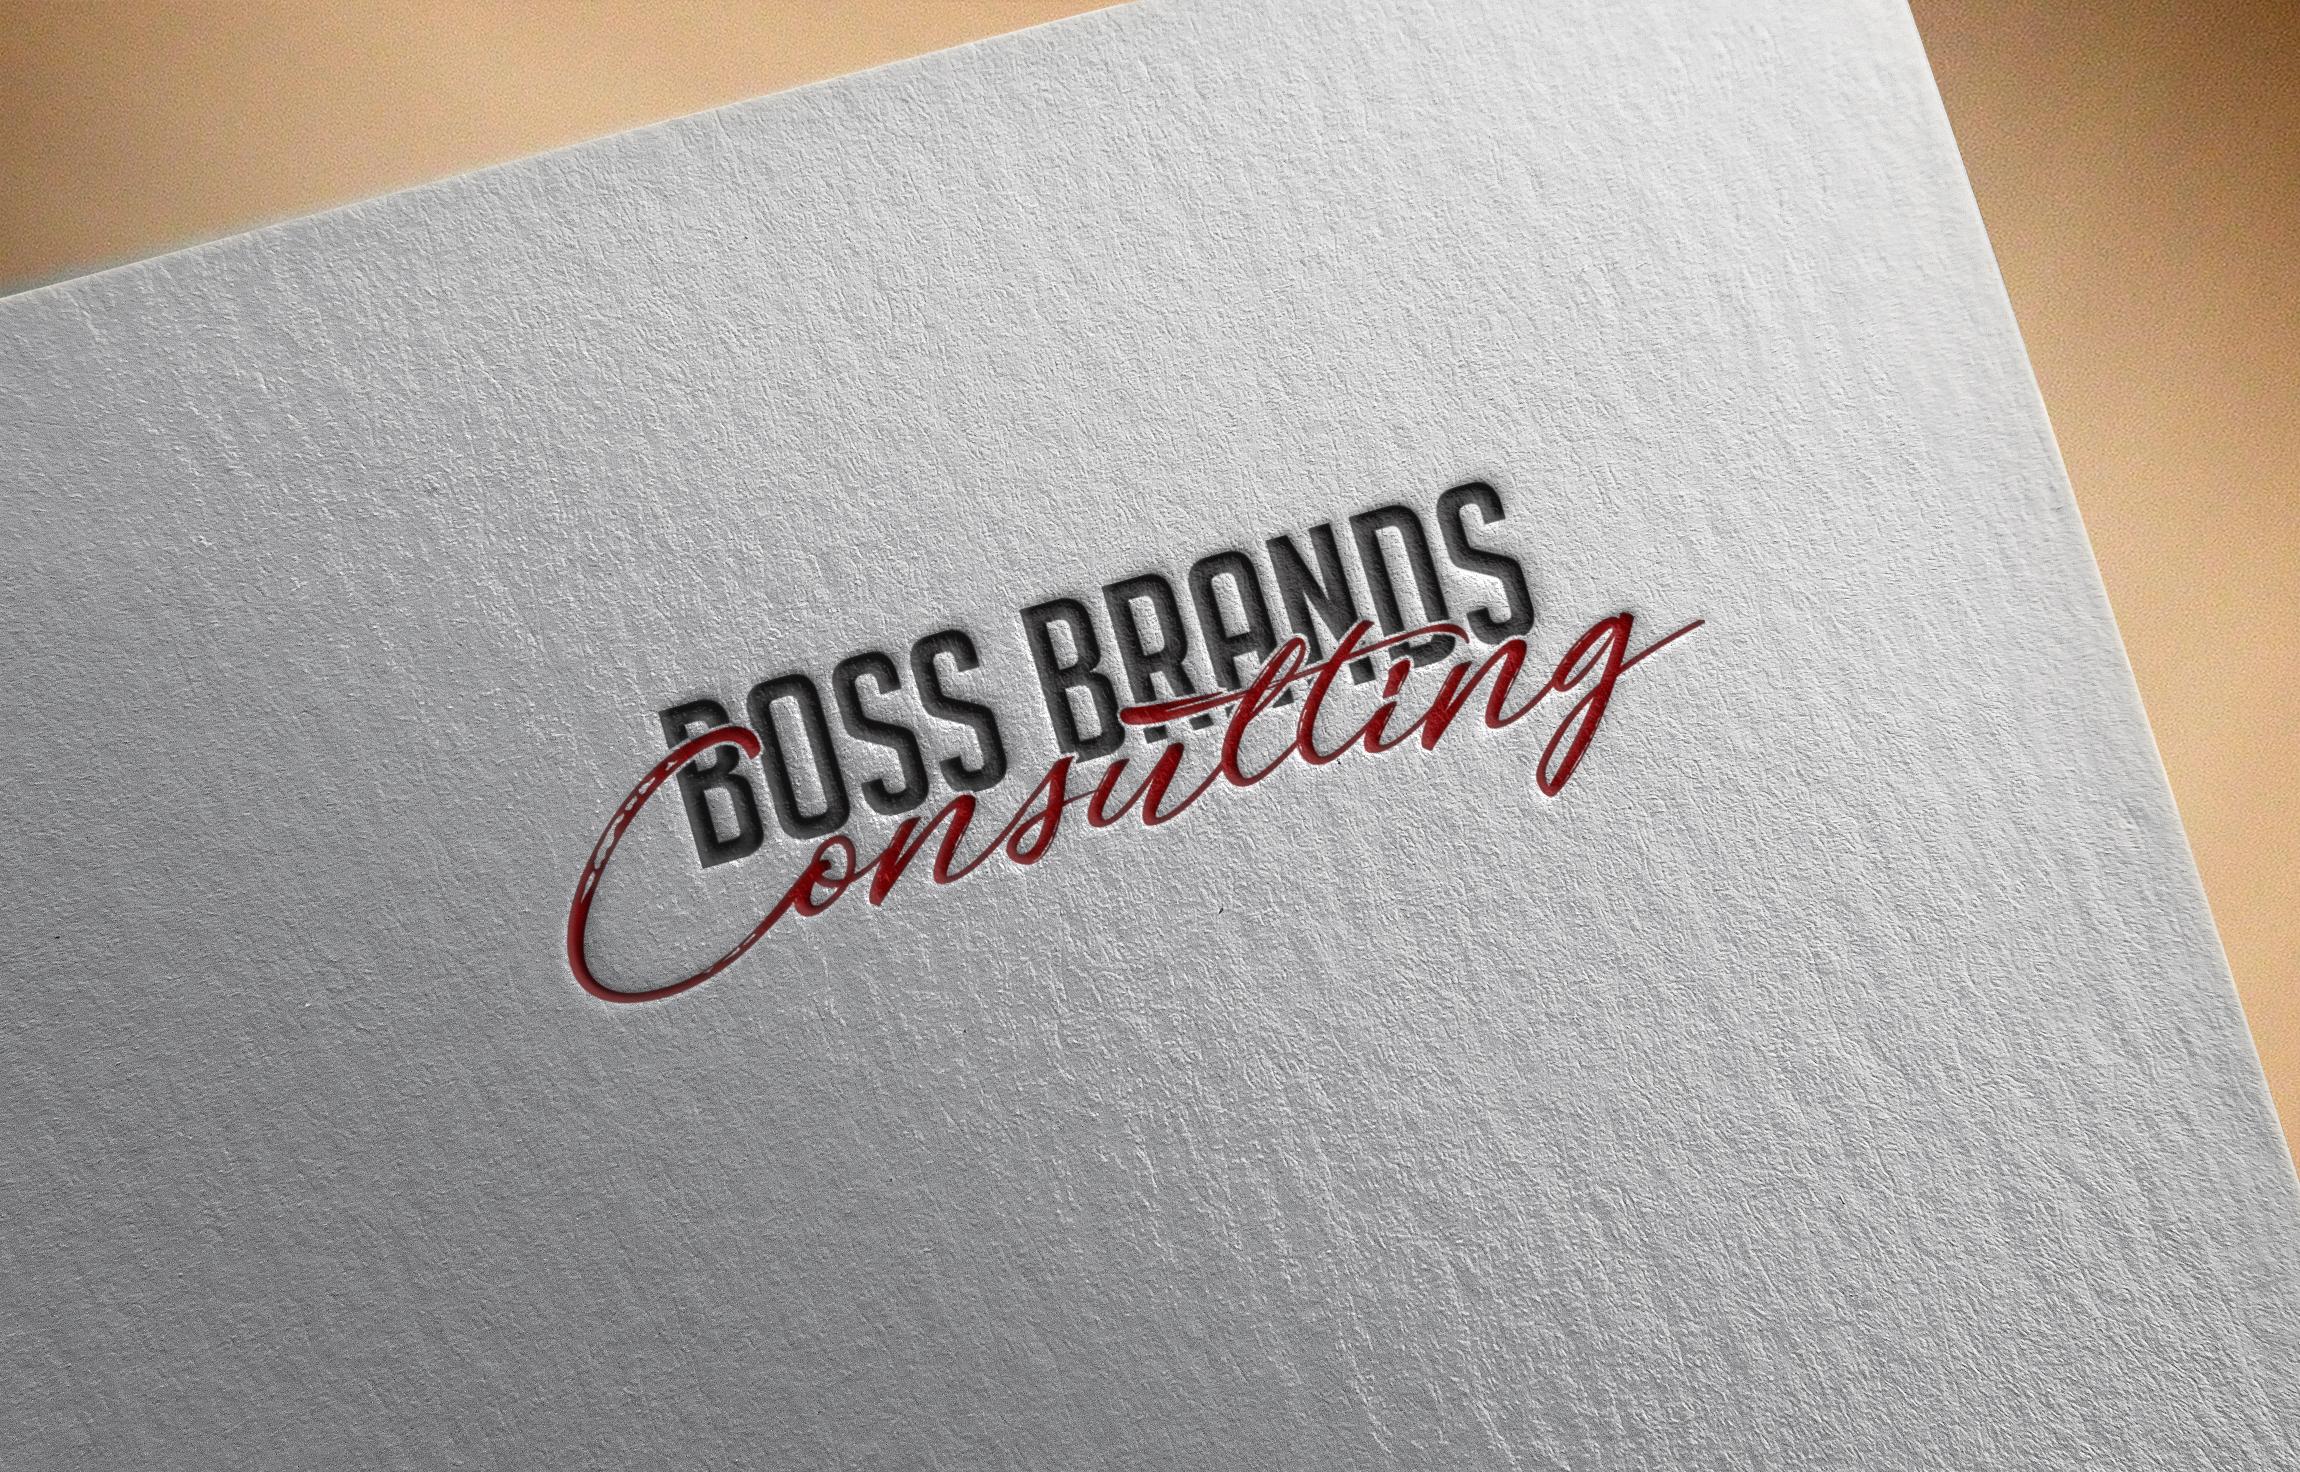 Boss Brands.jpg